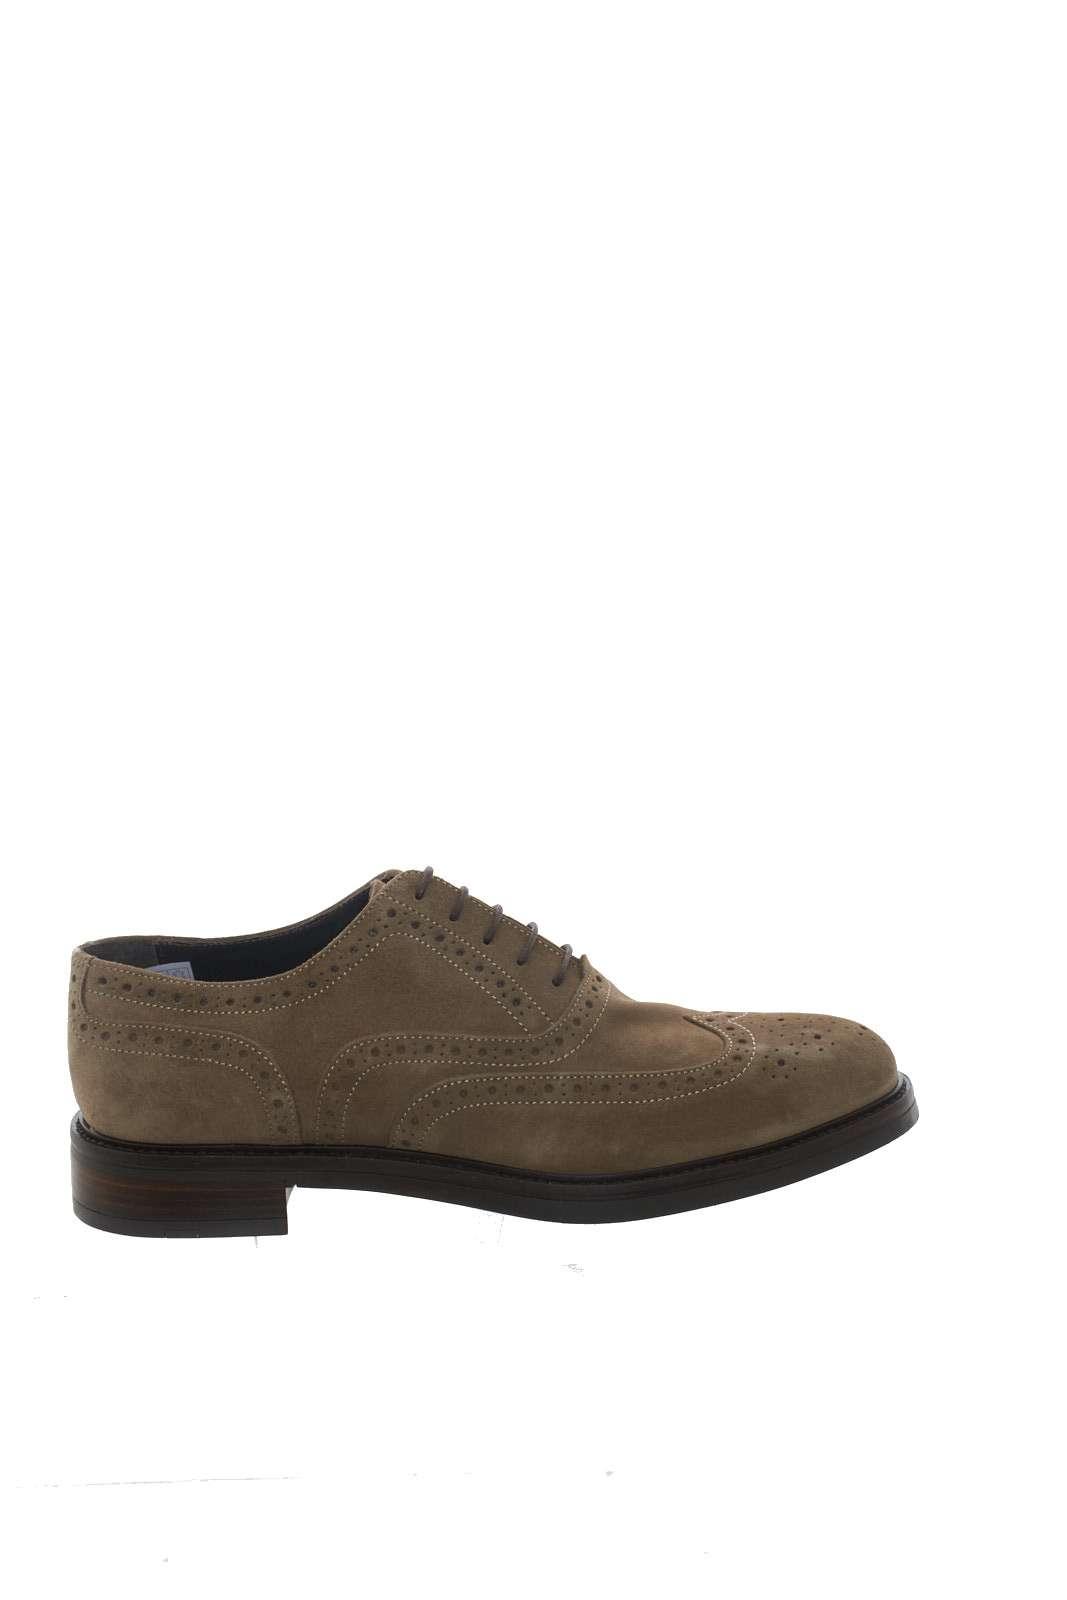 https://www.parmax.com/media/catalog/product/a/i/AI-outlet_parmax-scarpe-uomo-Libero%20Fashion-7582-C.jpg